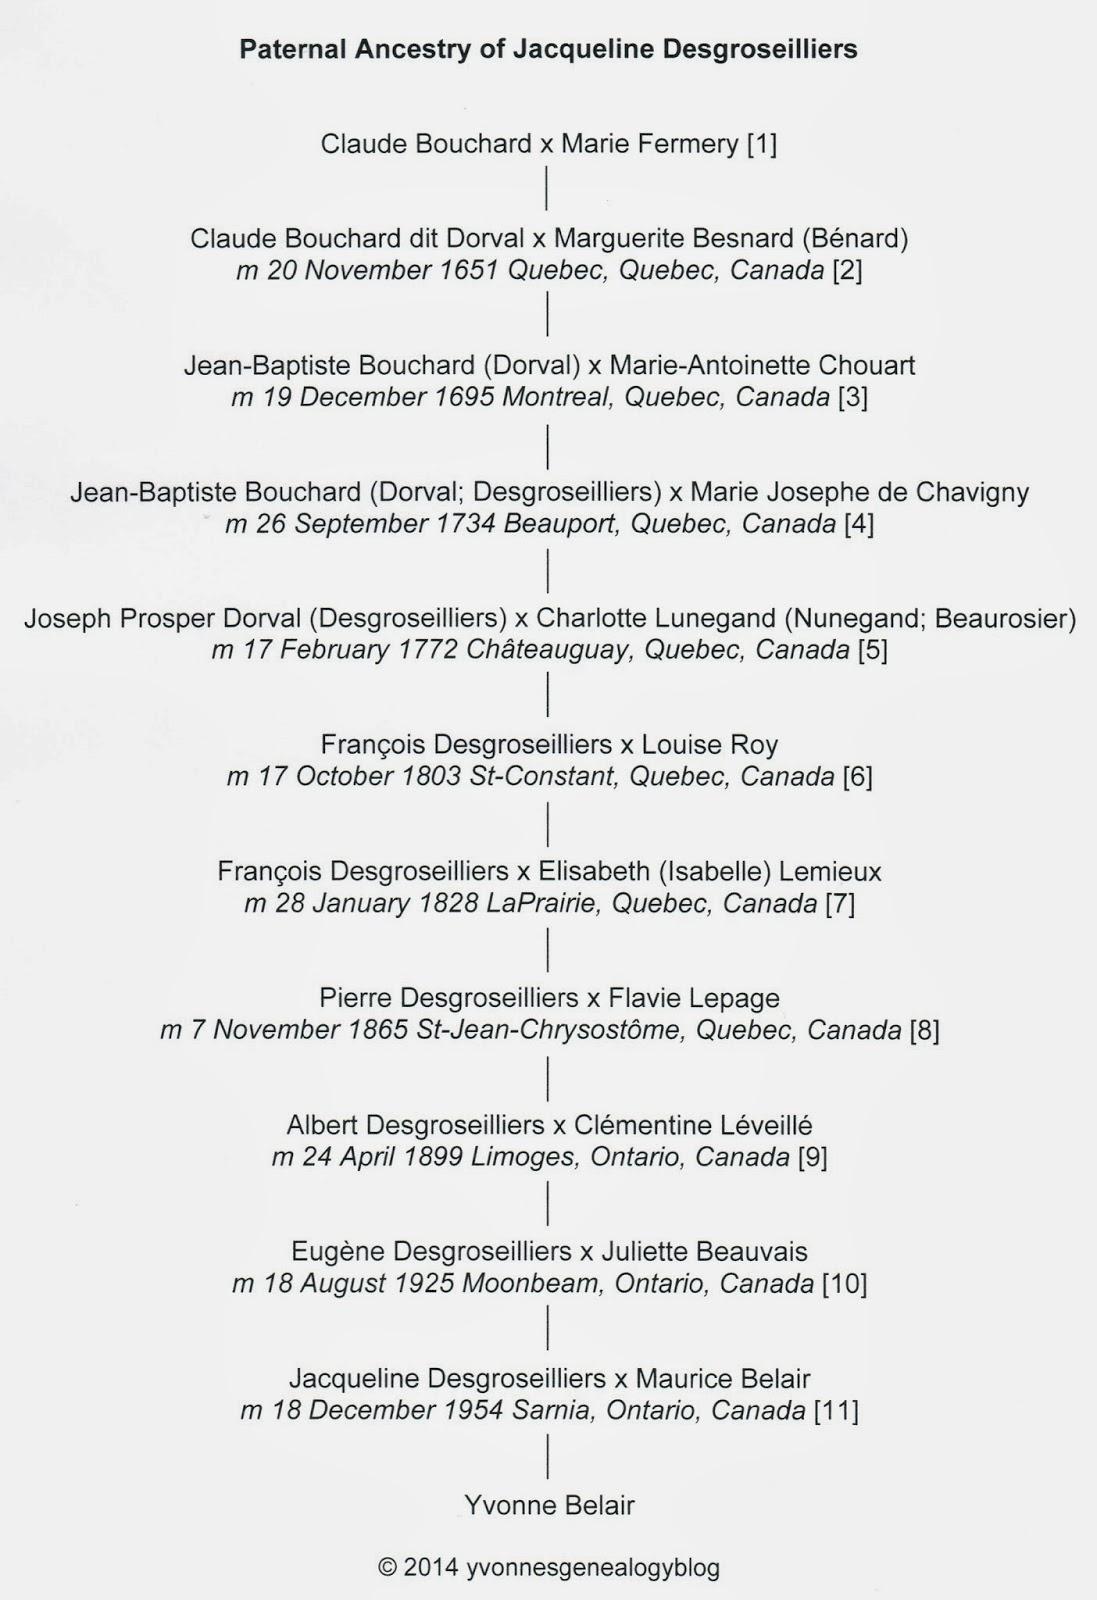 Paternal Ancestry of Jacqueline Desgroseilliers